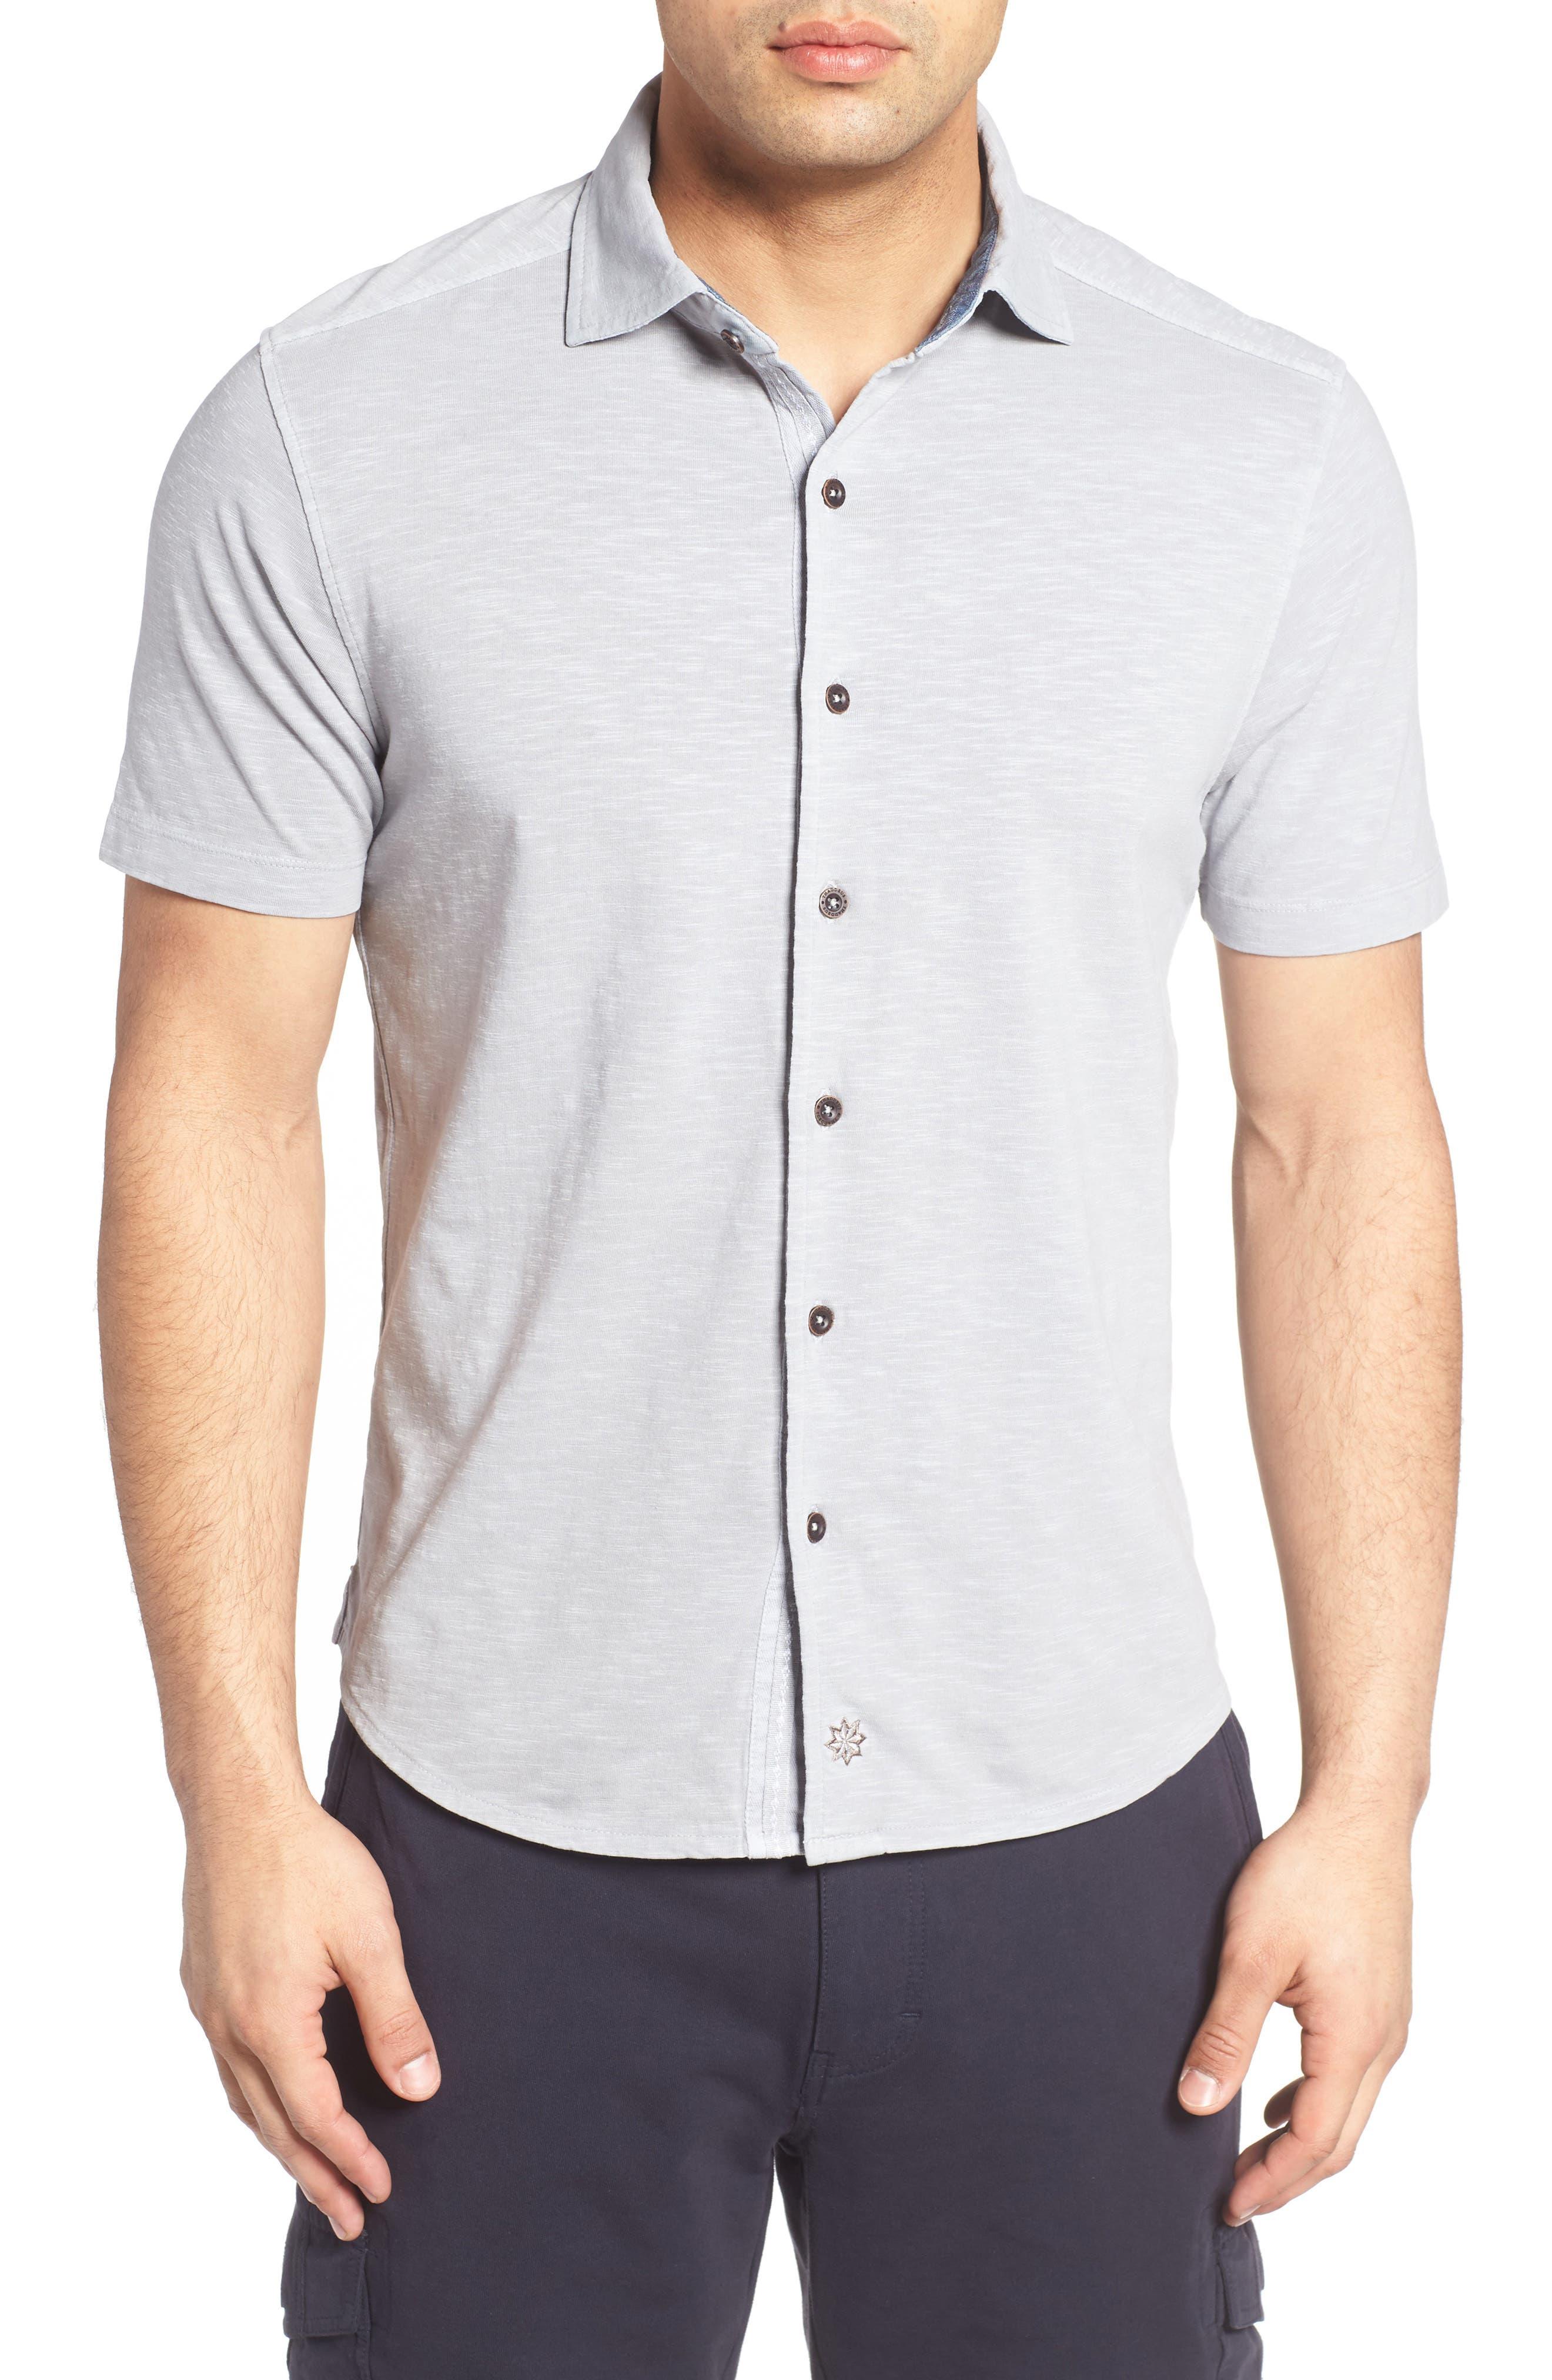 McAdams Slub Jersey Sport Shirt,                             Main thumbnail 1, color,                             020